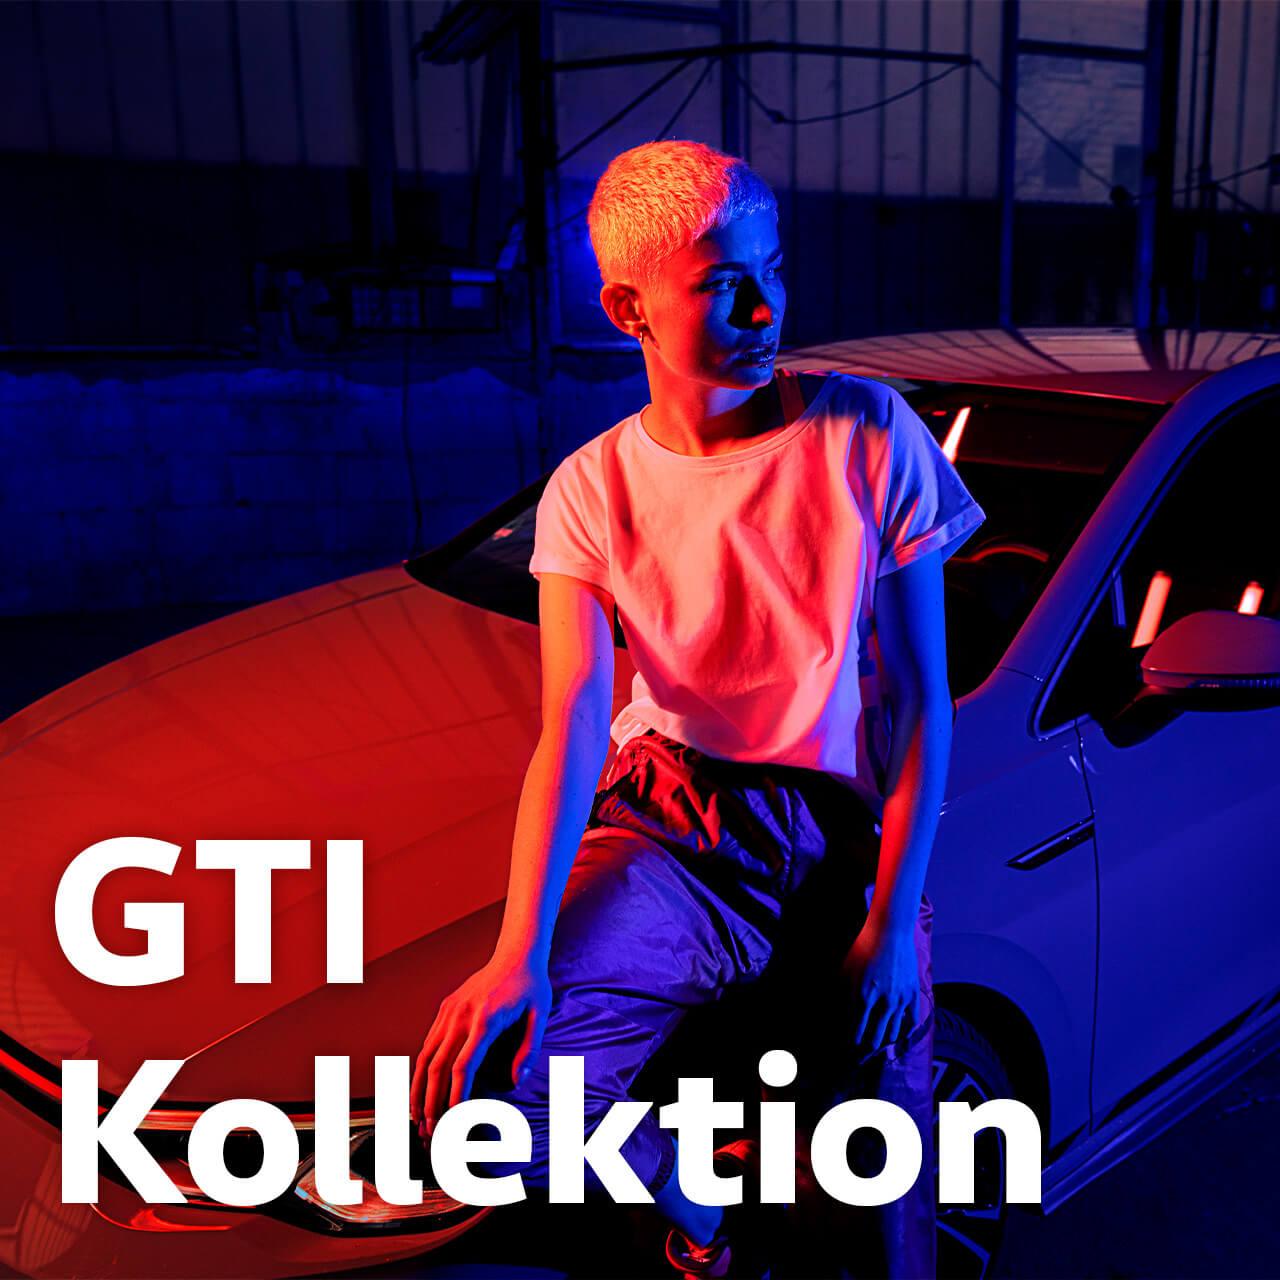 VW GTI Kollektion